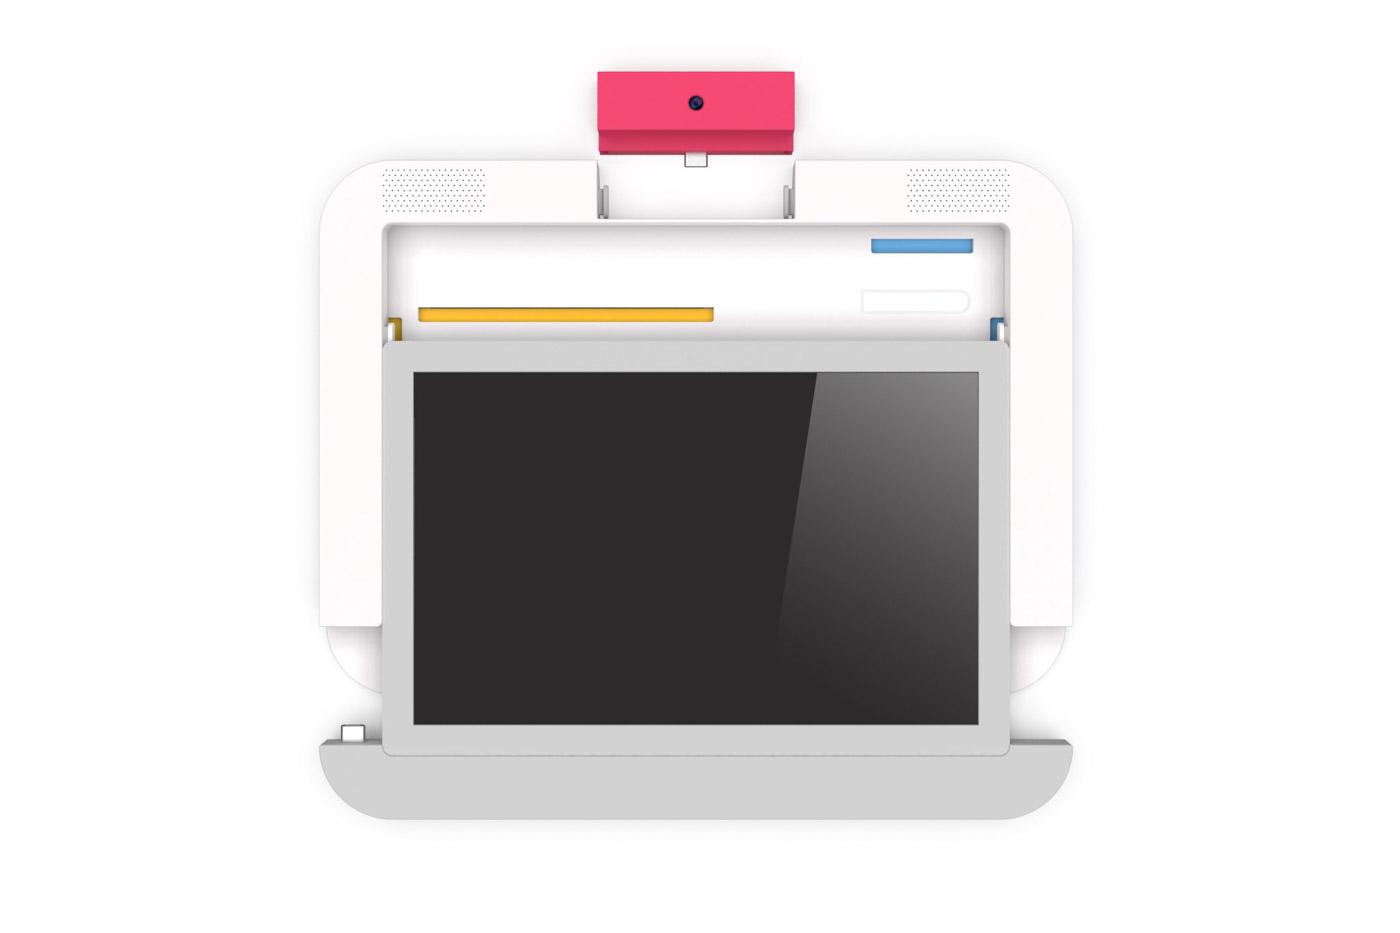 tablet-front-exploded.jpg